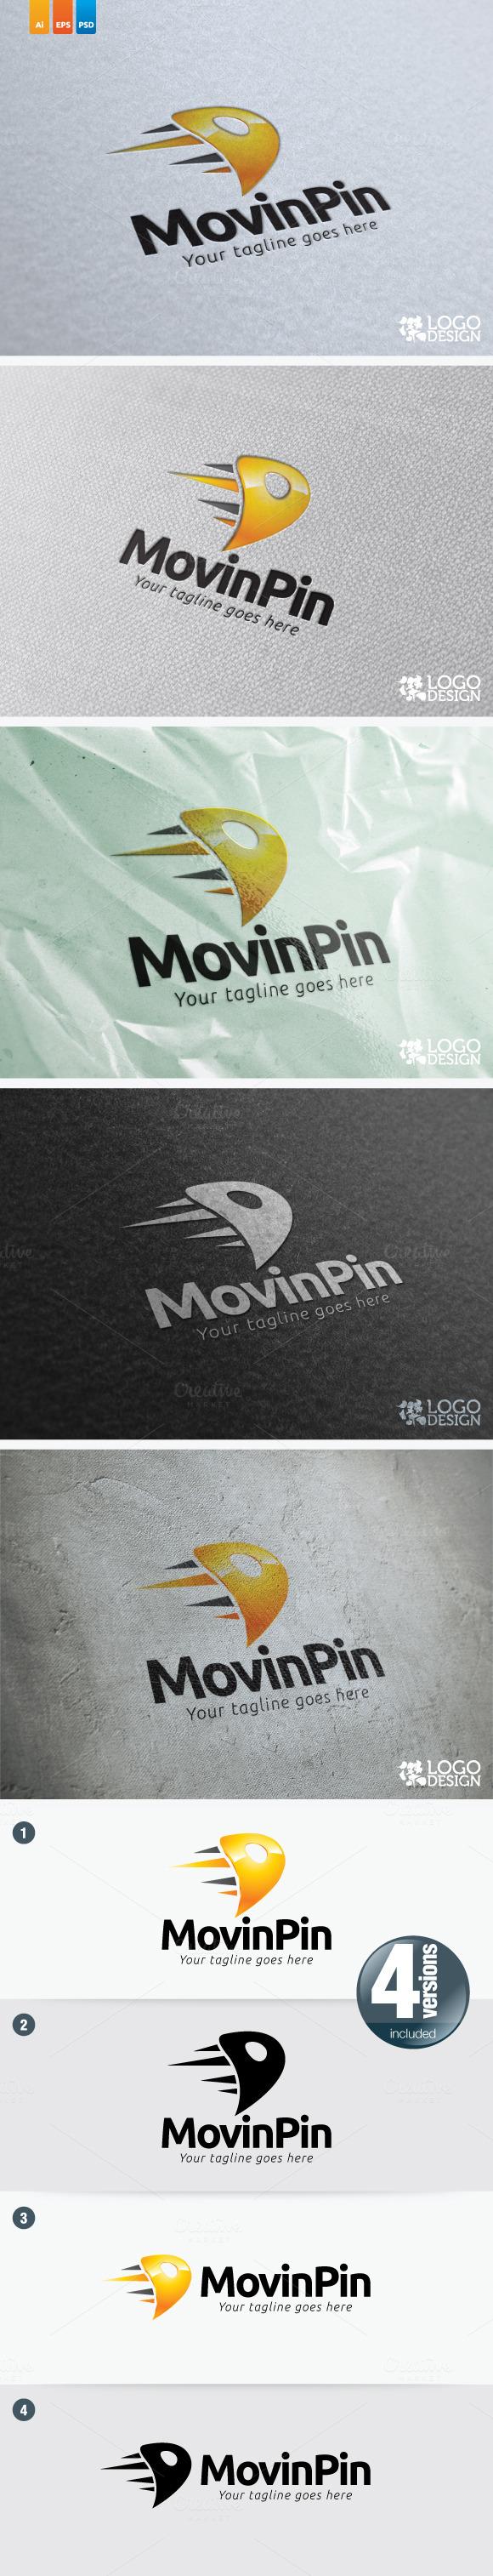 MovinPin